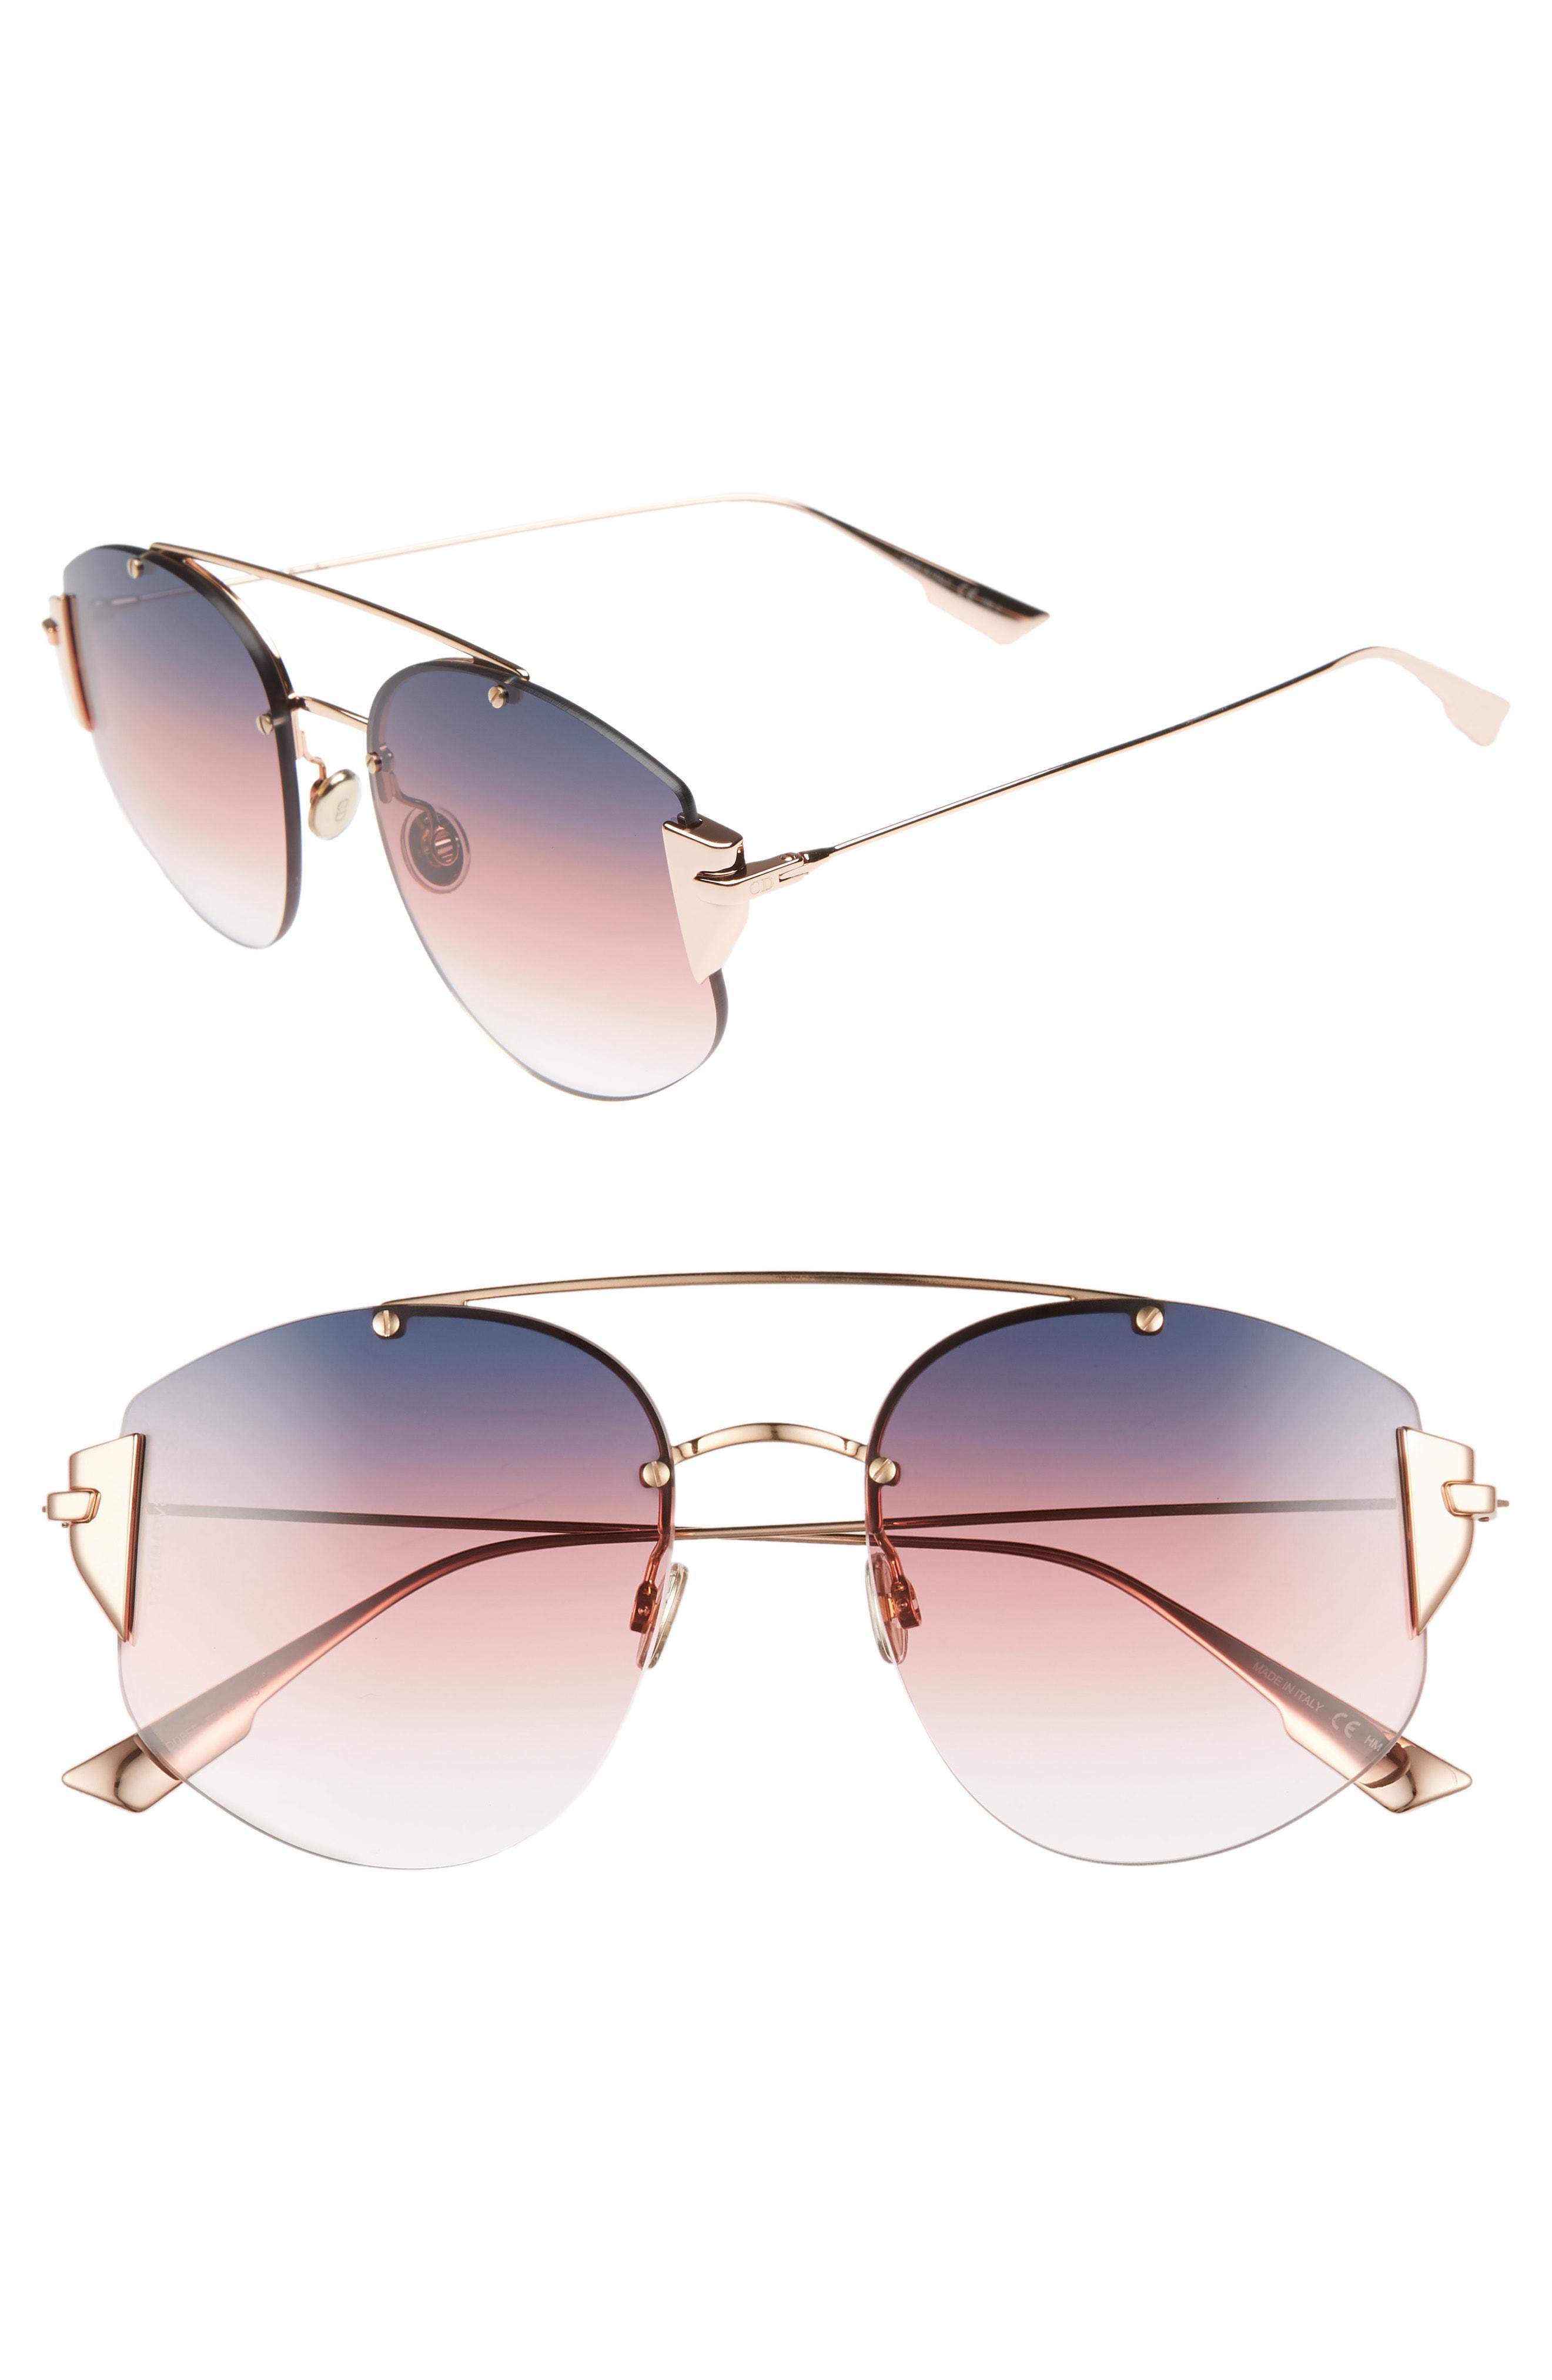 d866b328214f Dior Women s Stronger Mirrored Brow Bar Rimless Square Sunglasses ...